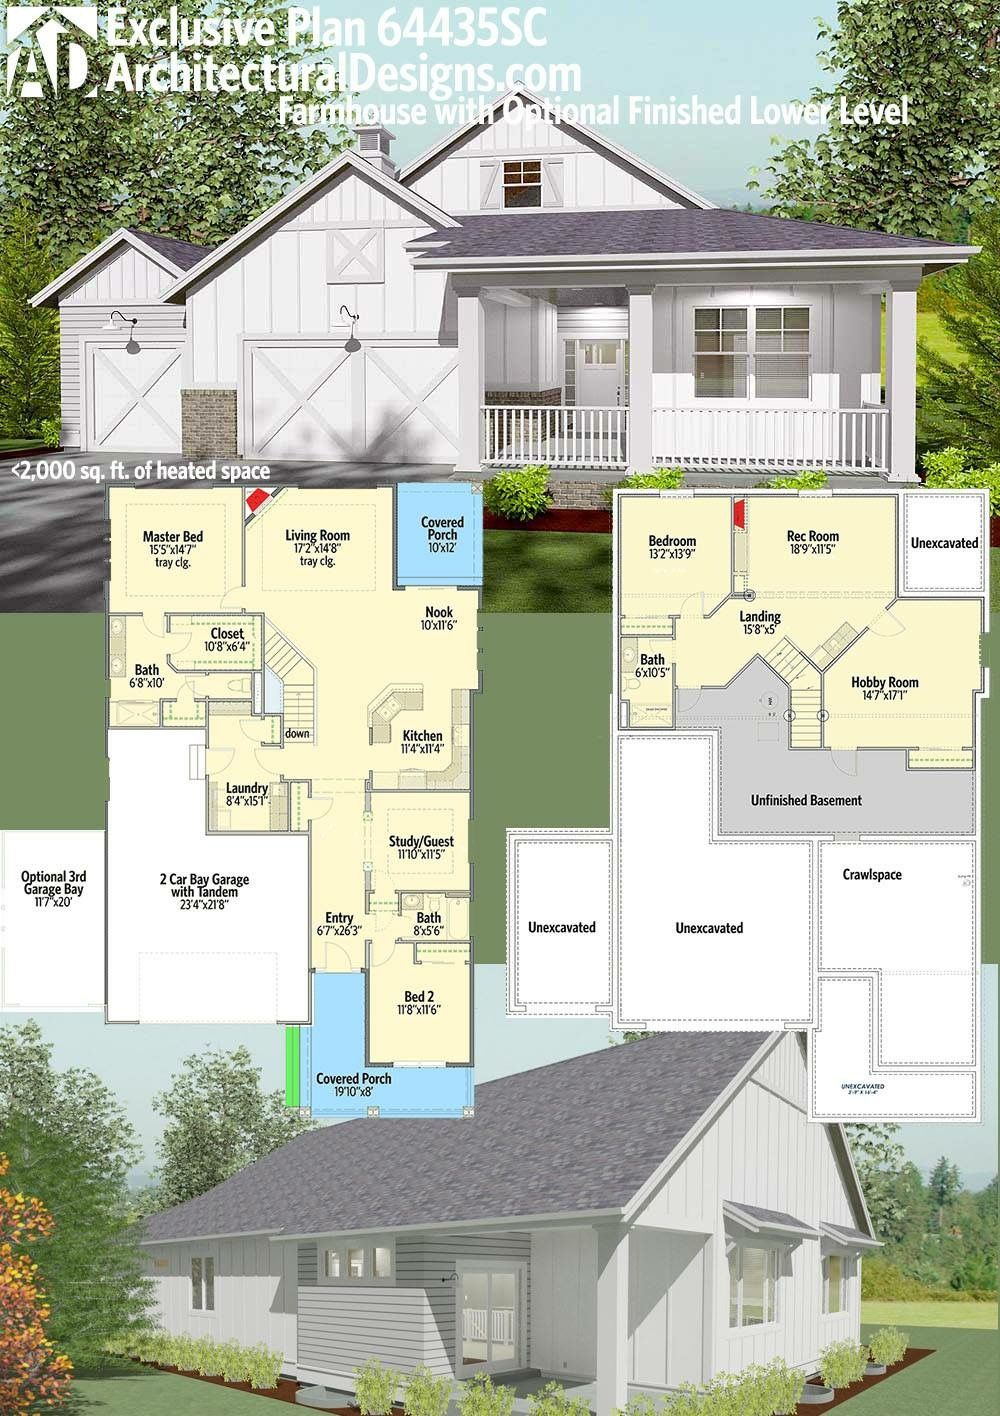 Plan 64435sc Modern Farmhouse Plan With Optional Finished Lower Level Modern Farmhouse Plans Farmhouse Plans House Plans